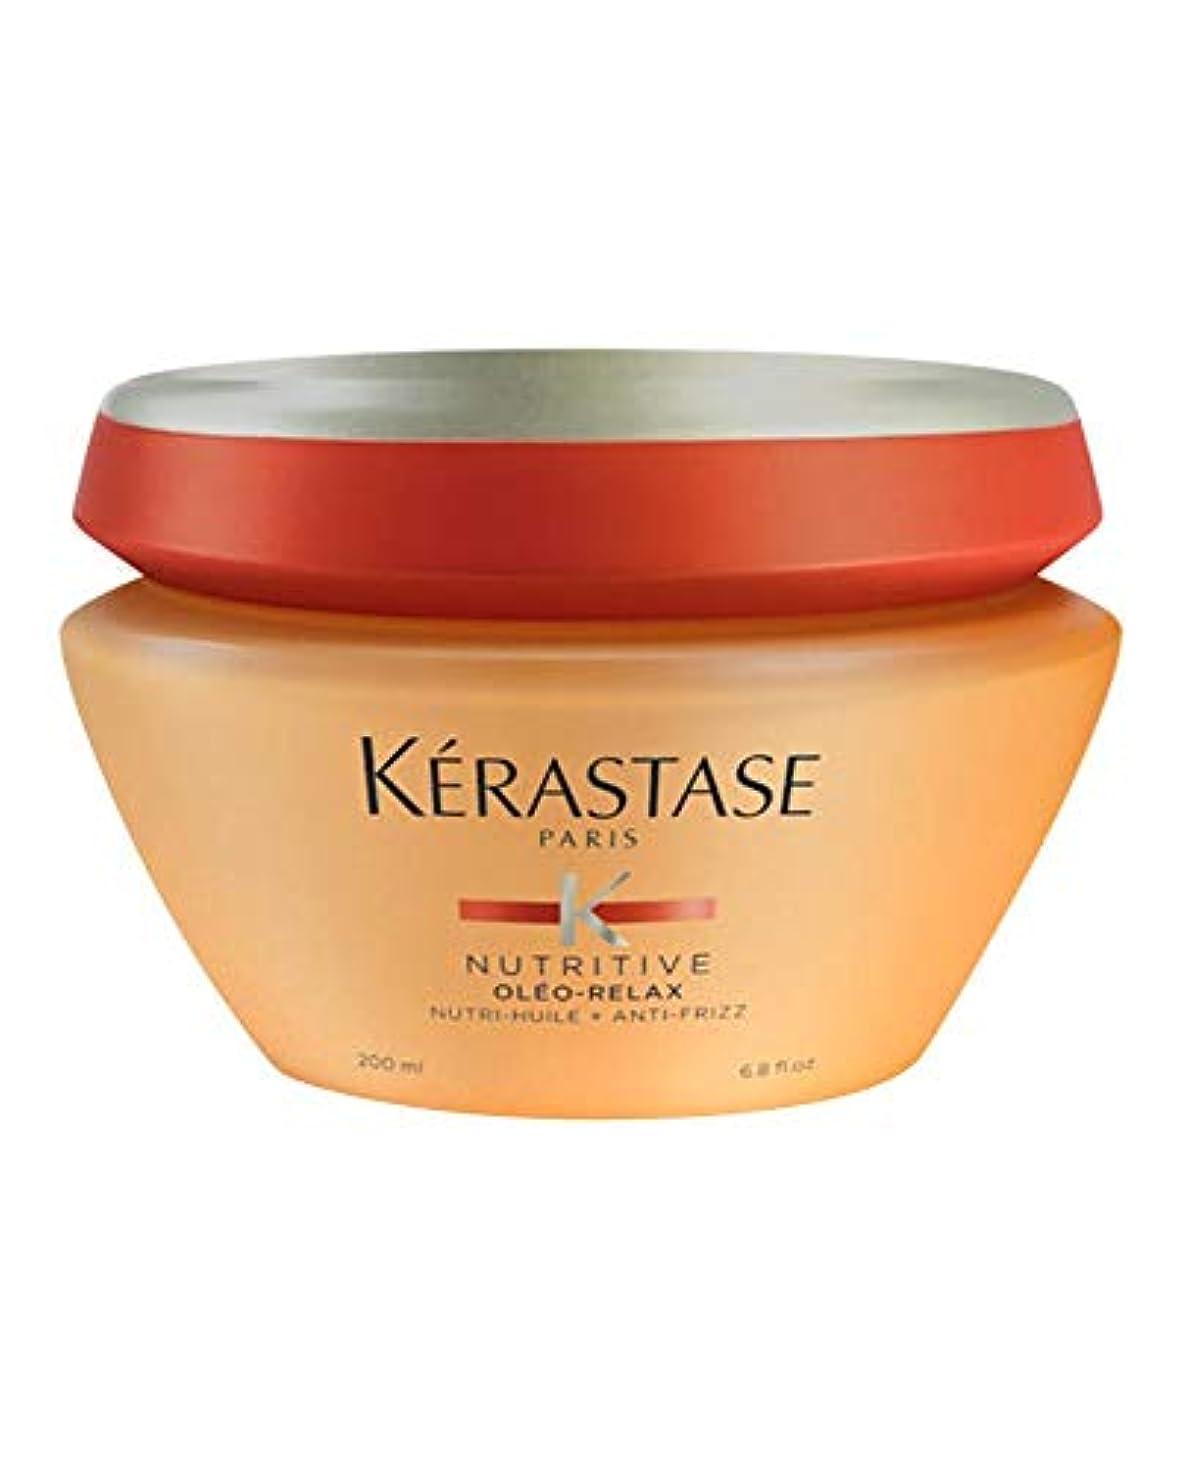 KERASTASE(ケラスターゼ) NU マスク オレオリラックス 200g